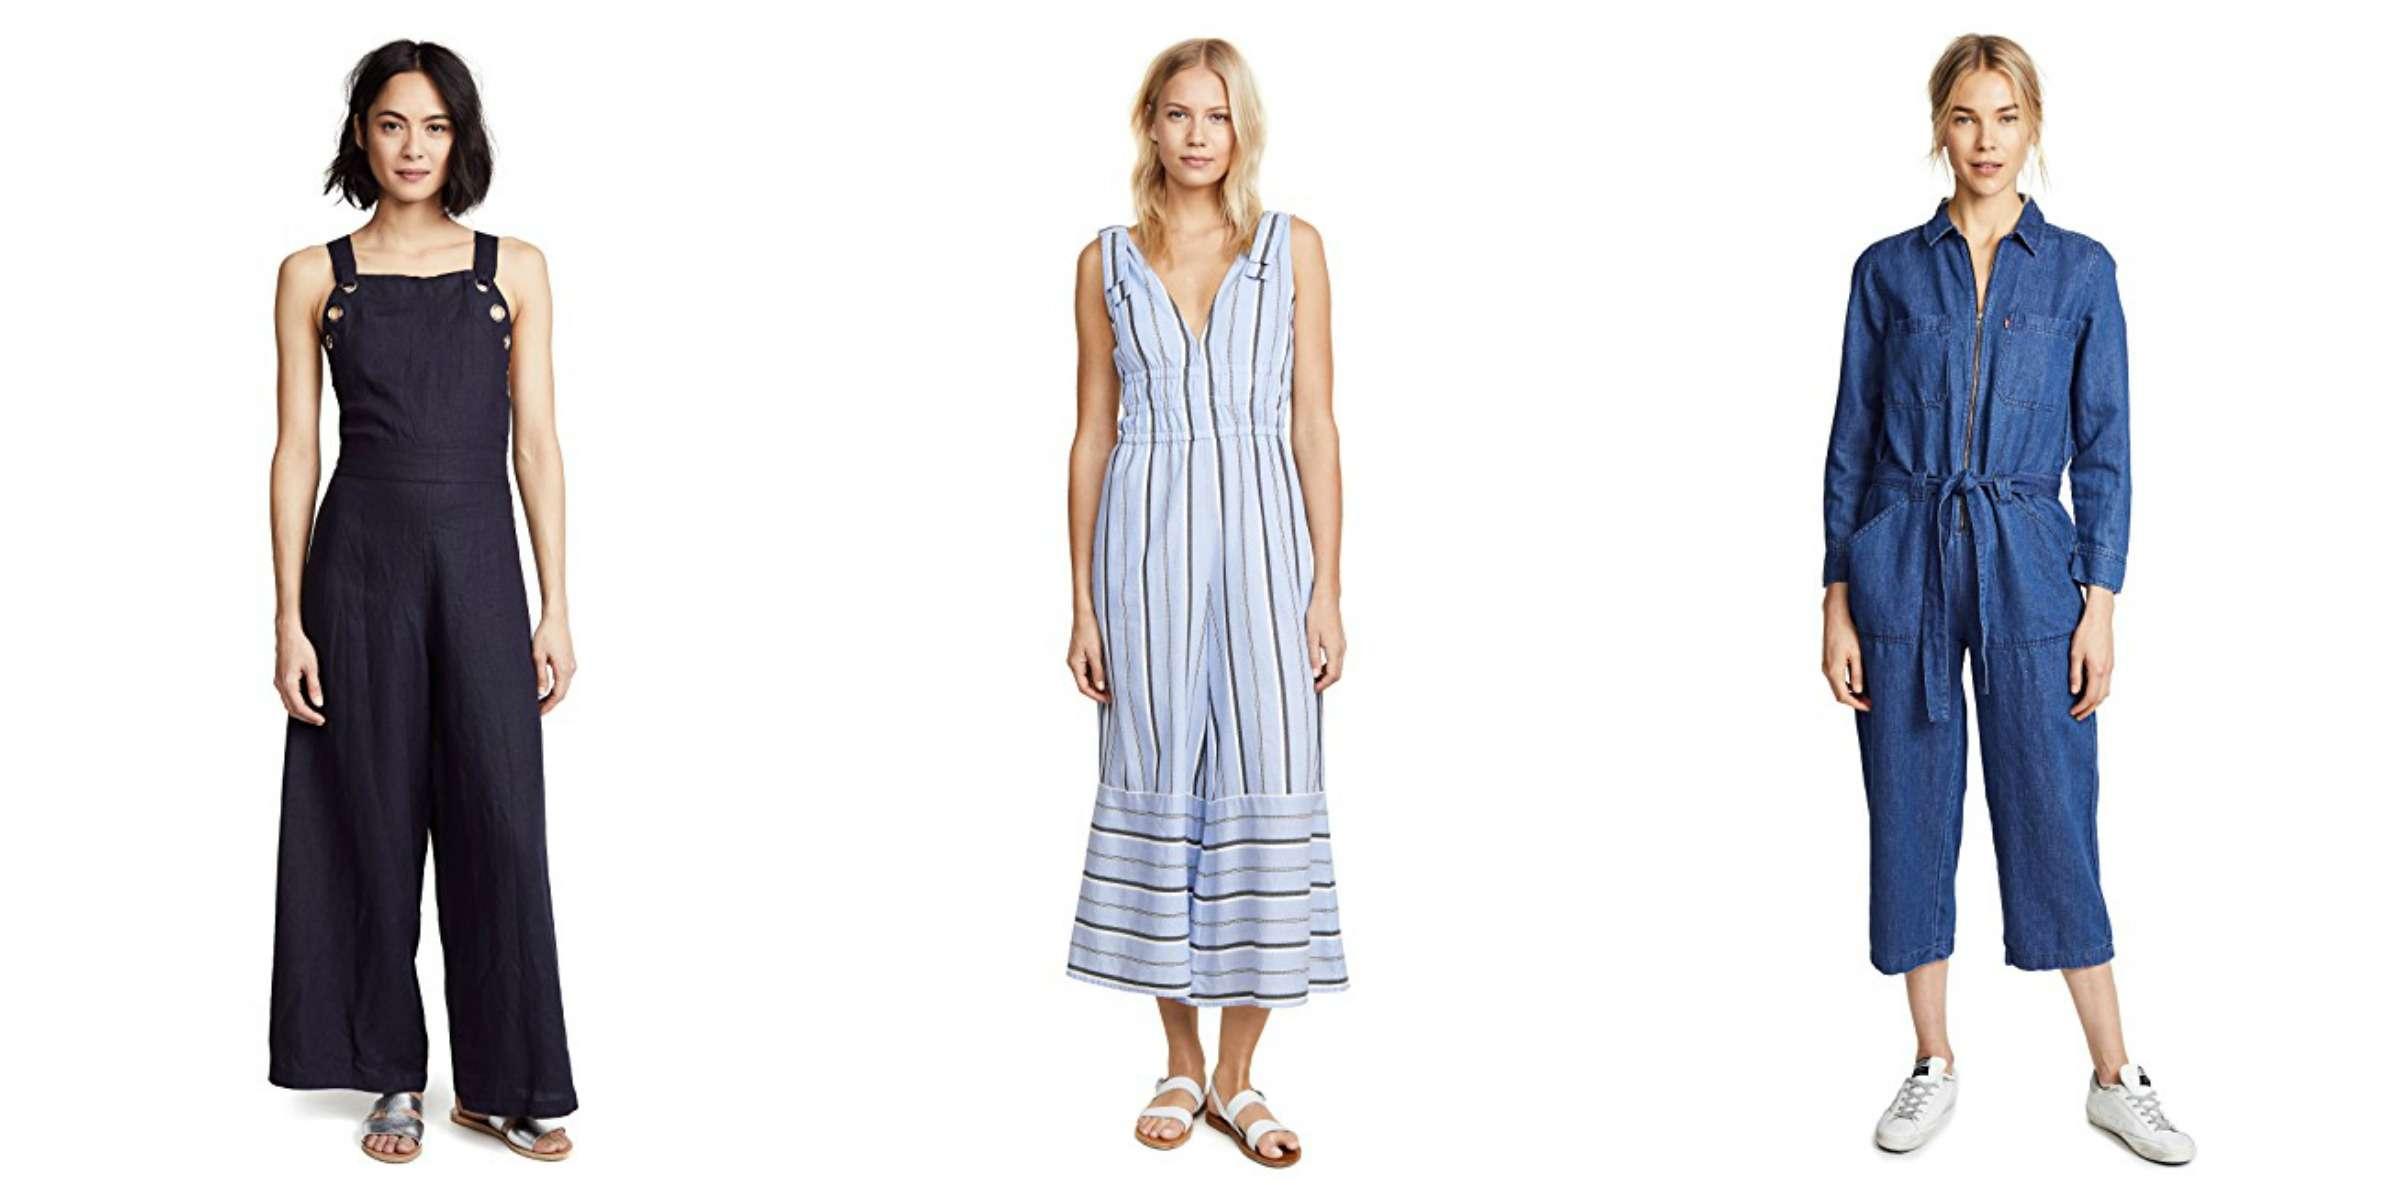 Shopbop Jumpsuits - Spring Sale Code